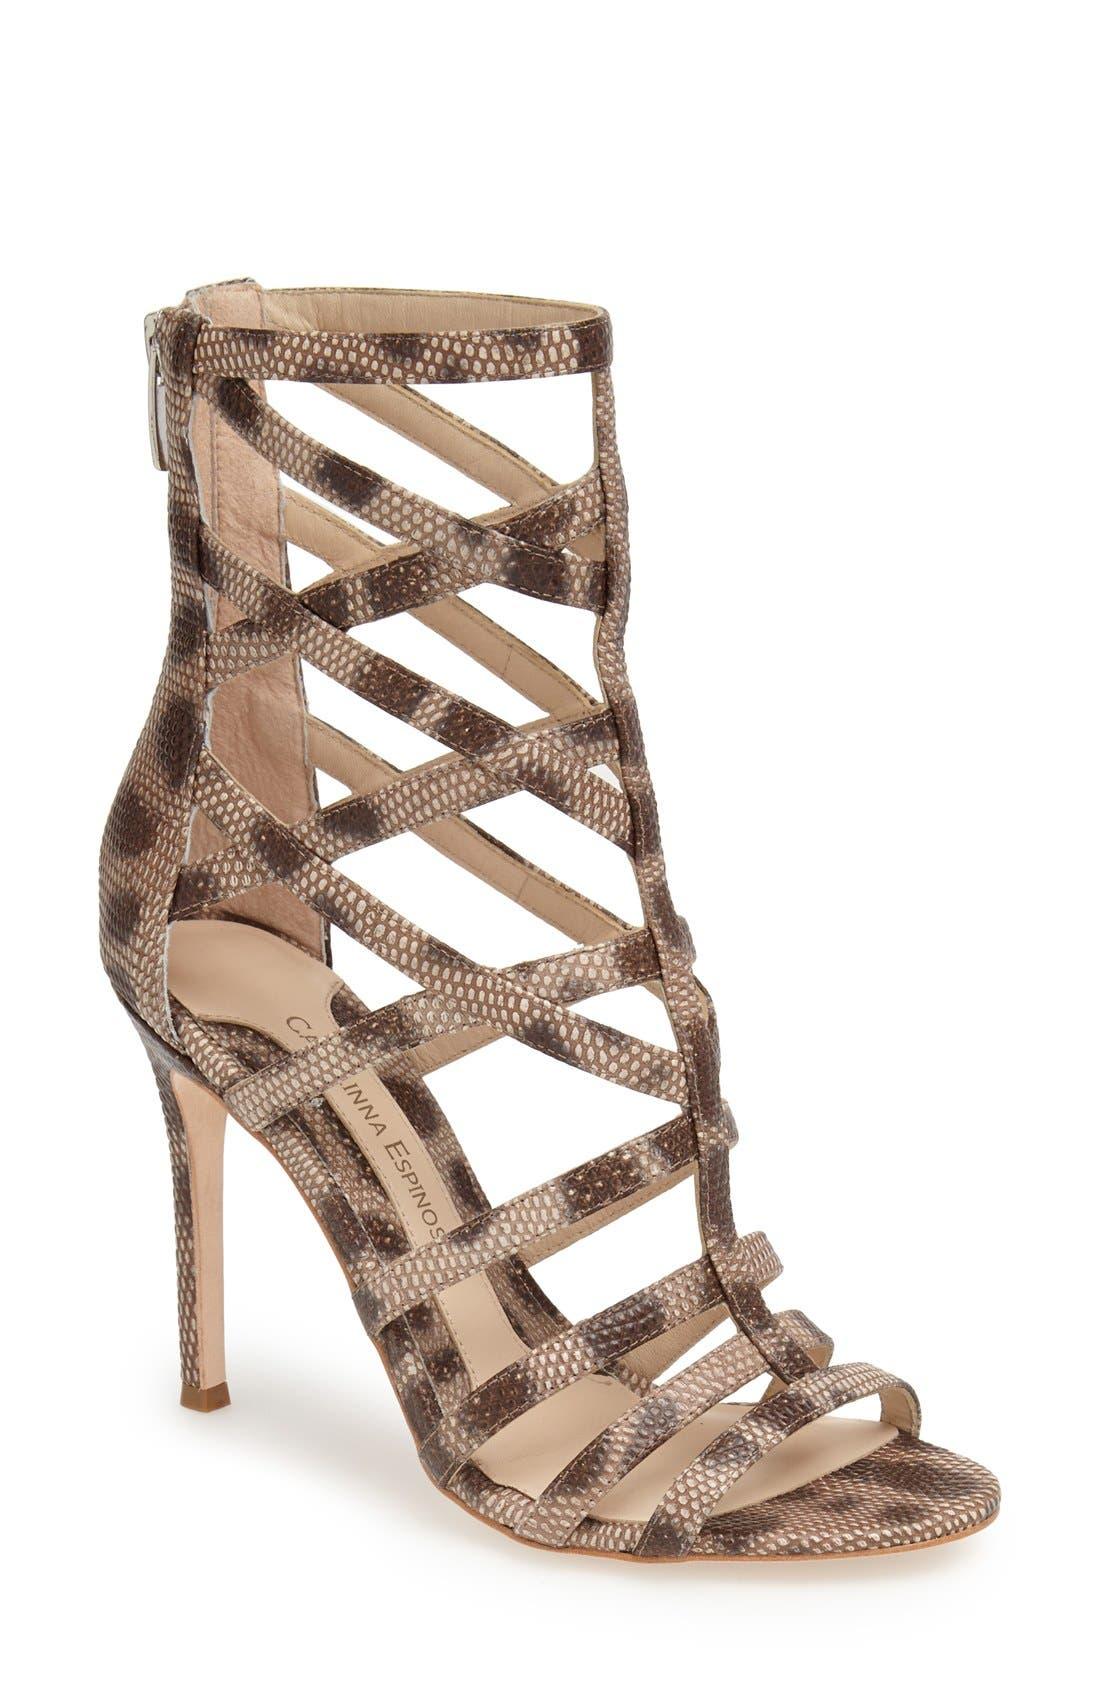 Alternate Image 1 Selected - Carolinna Espinosa 'Sari' Sandal